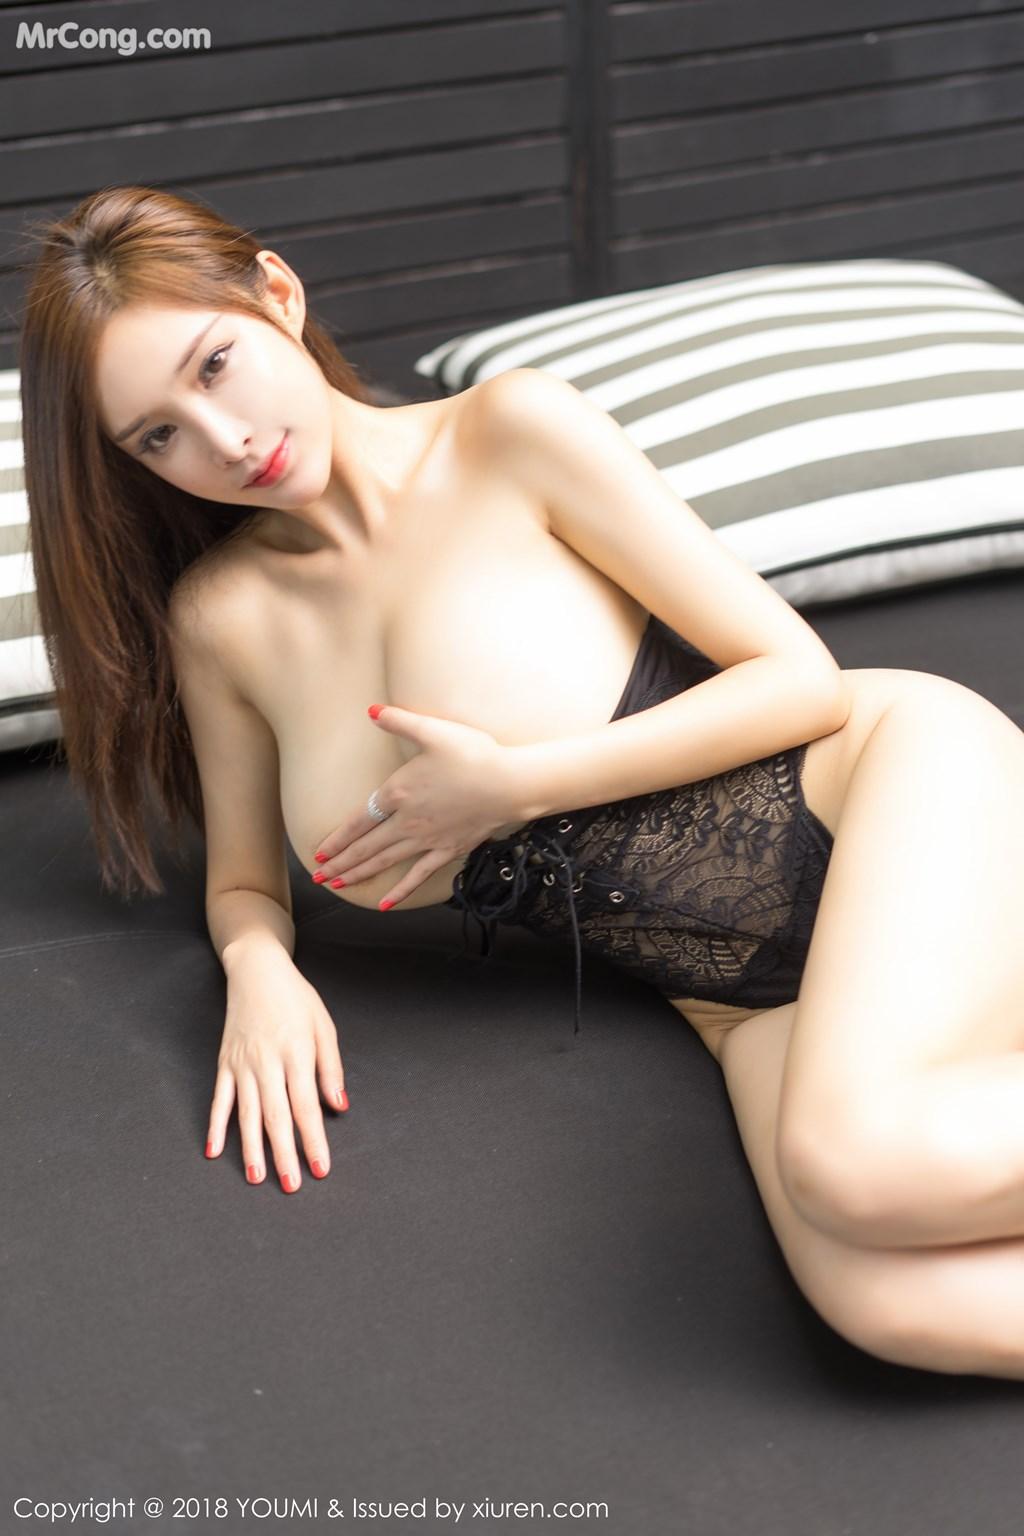 Image YouMi-Vol.213-Tu-Fei-Yuan-Ai-Cuo-Qiong-MrCong.com-007 in post YouMi Vol.213: Người mẫu 奶瓶土肥圆 (50 ảnh)